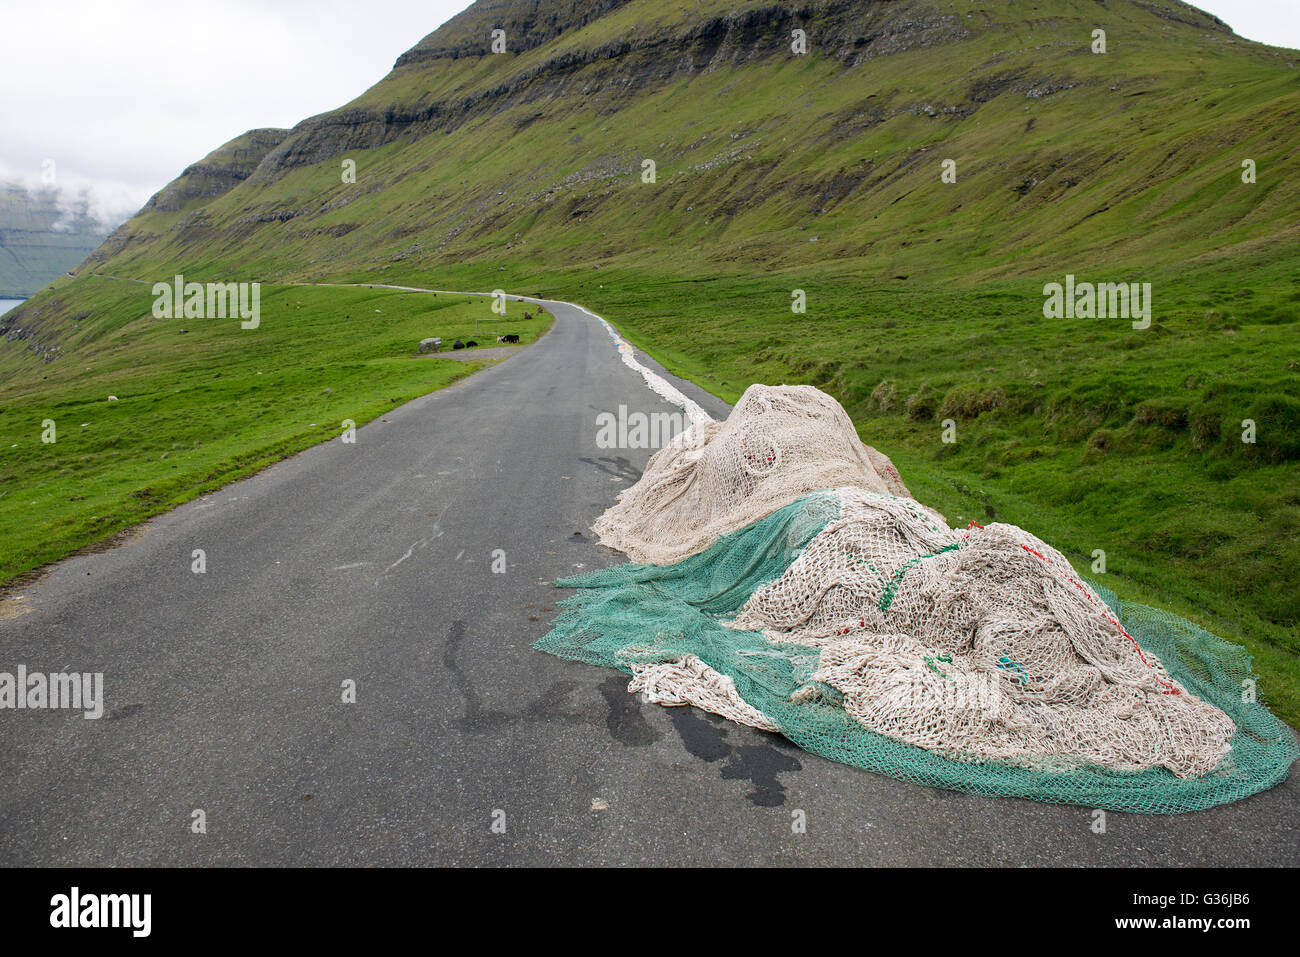 Fisher nets drying on a street on Eysturoy on the Faroe Islands - Stock Image